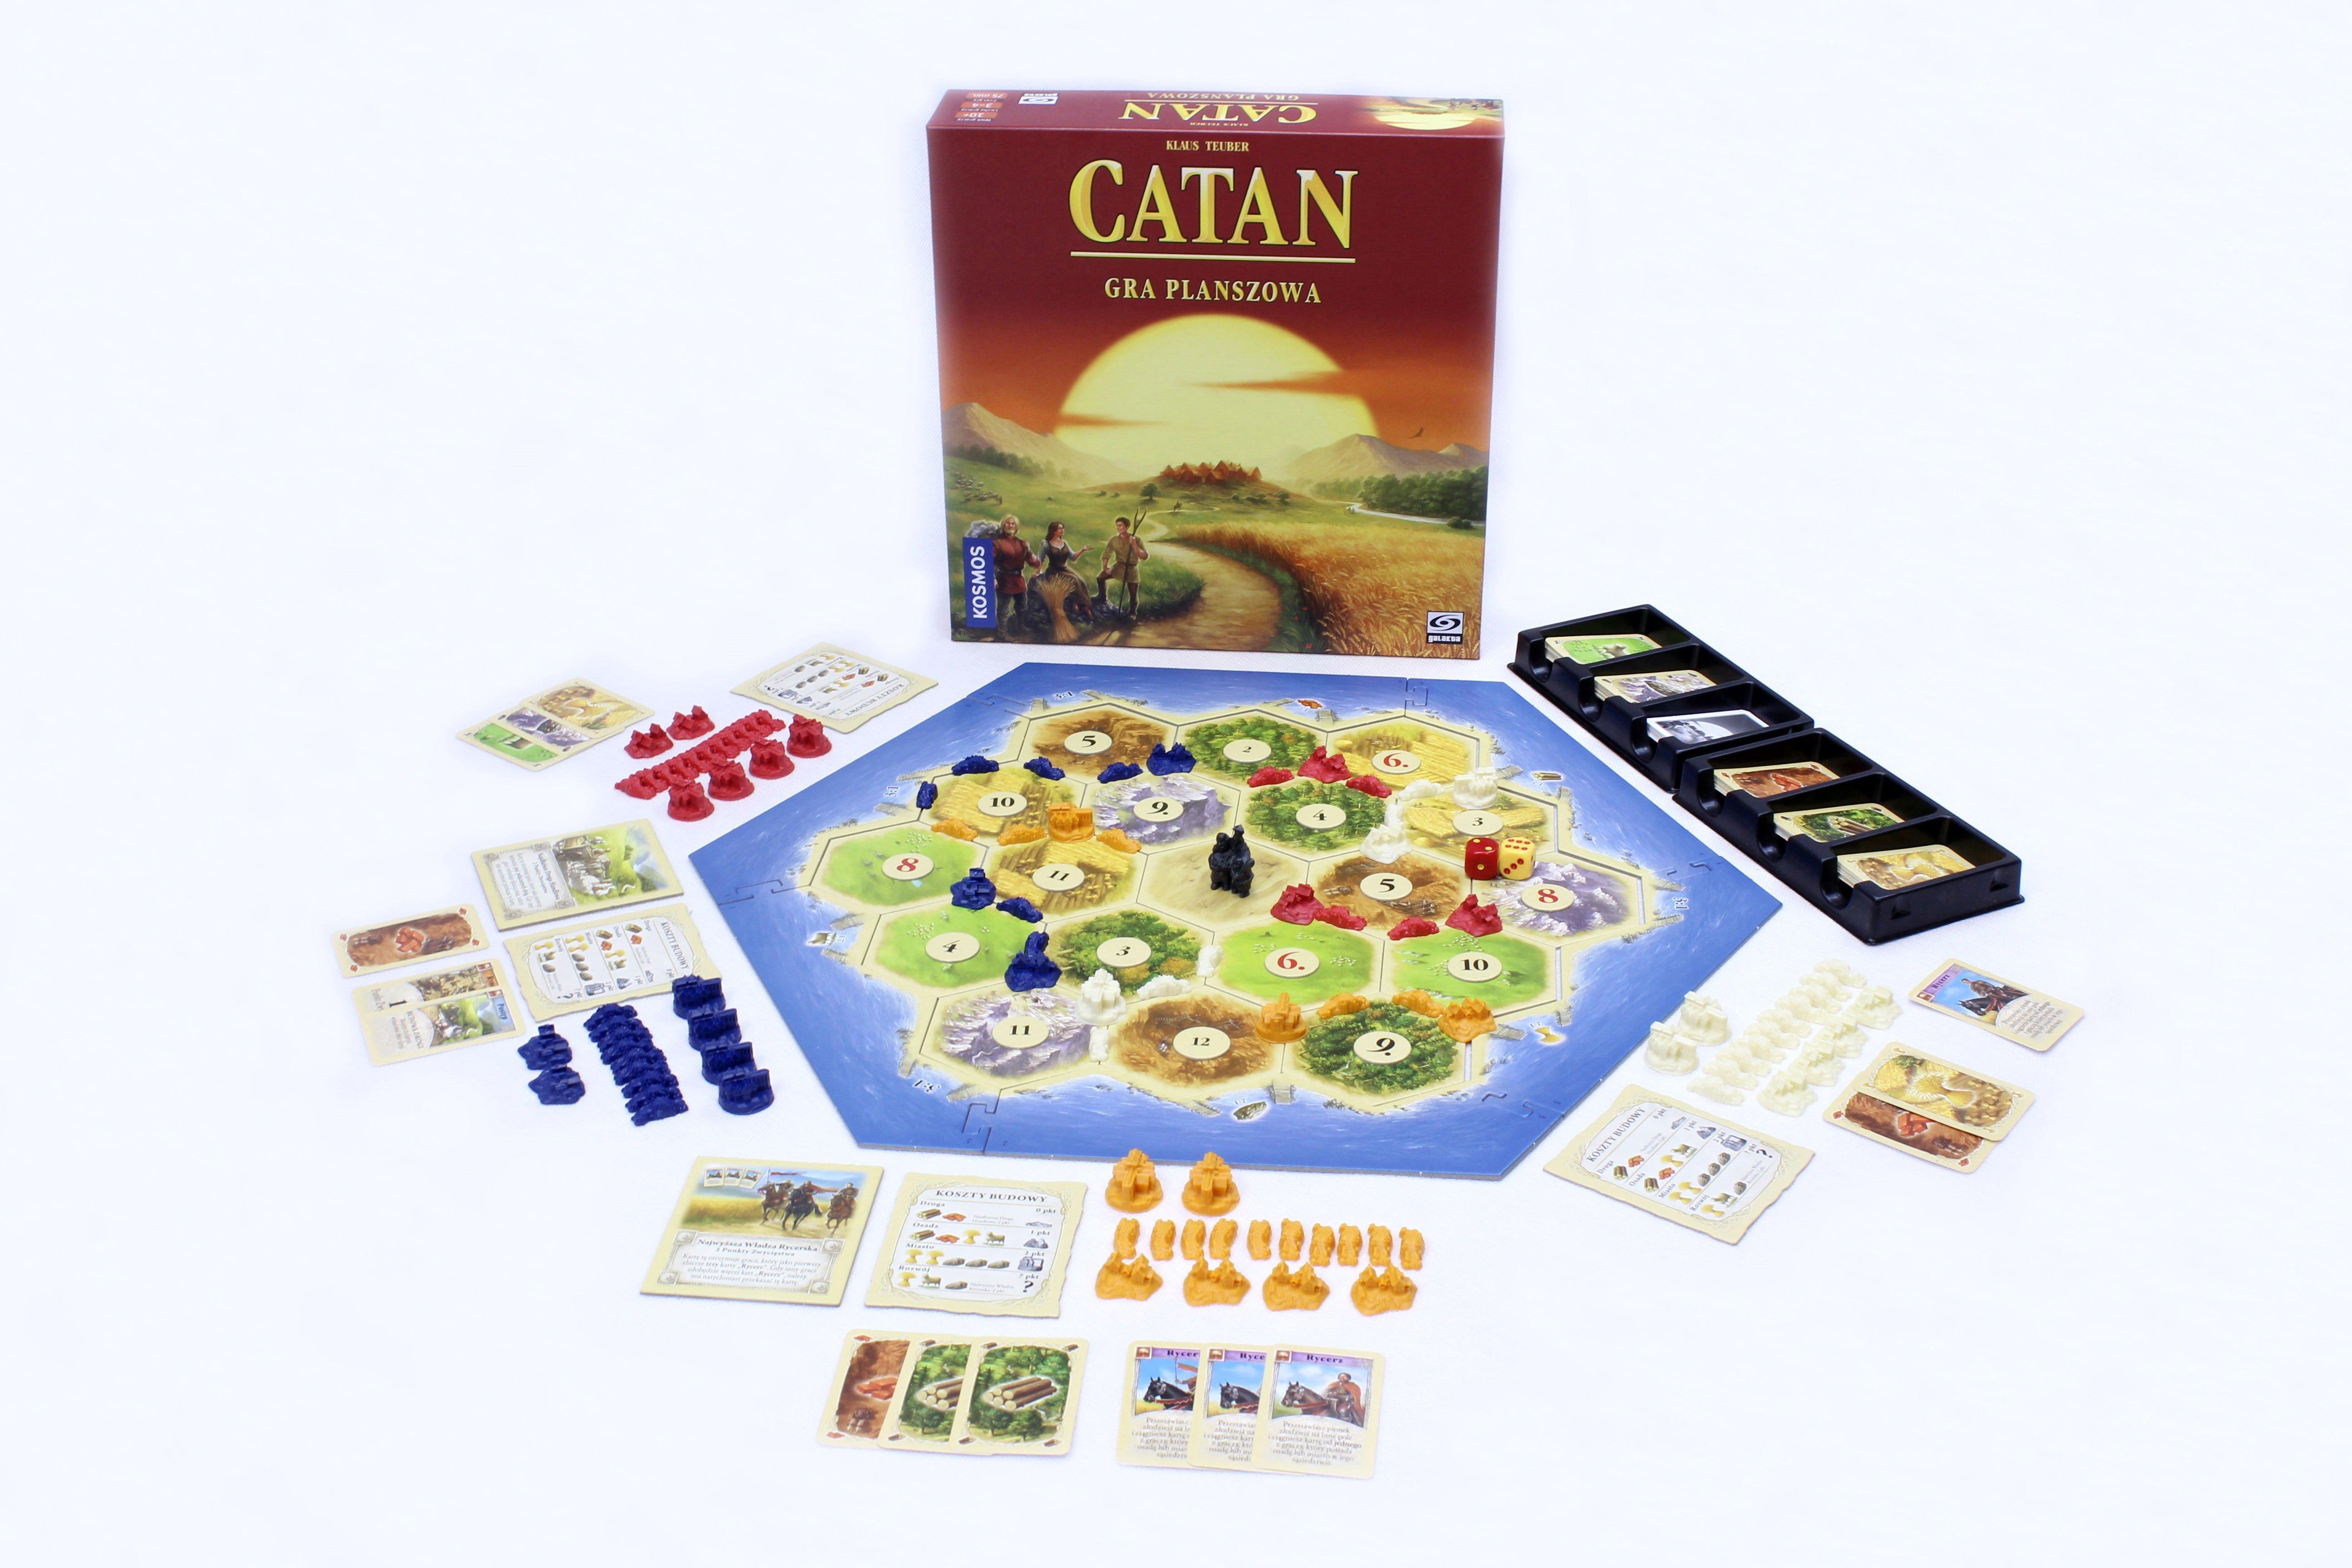 Catan - gra planszowa